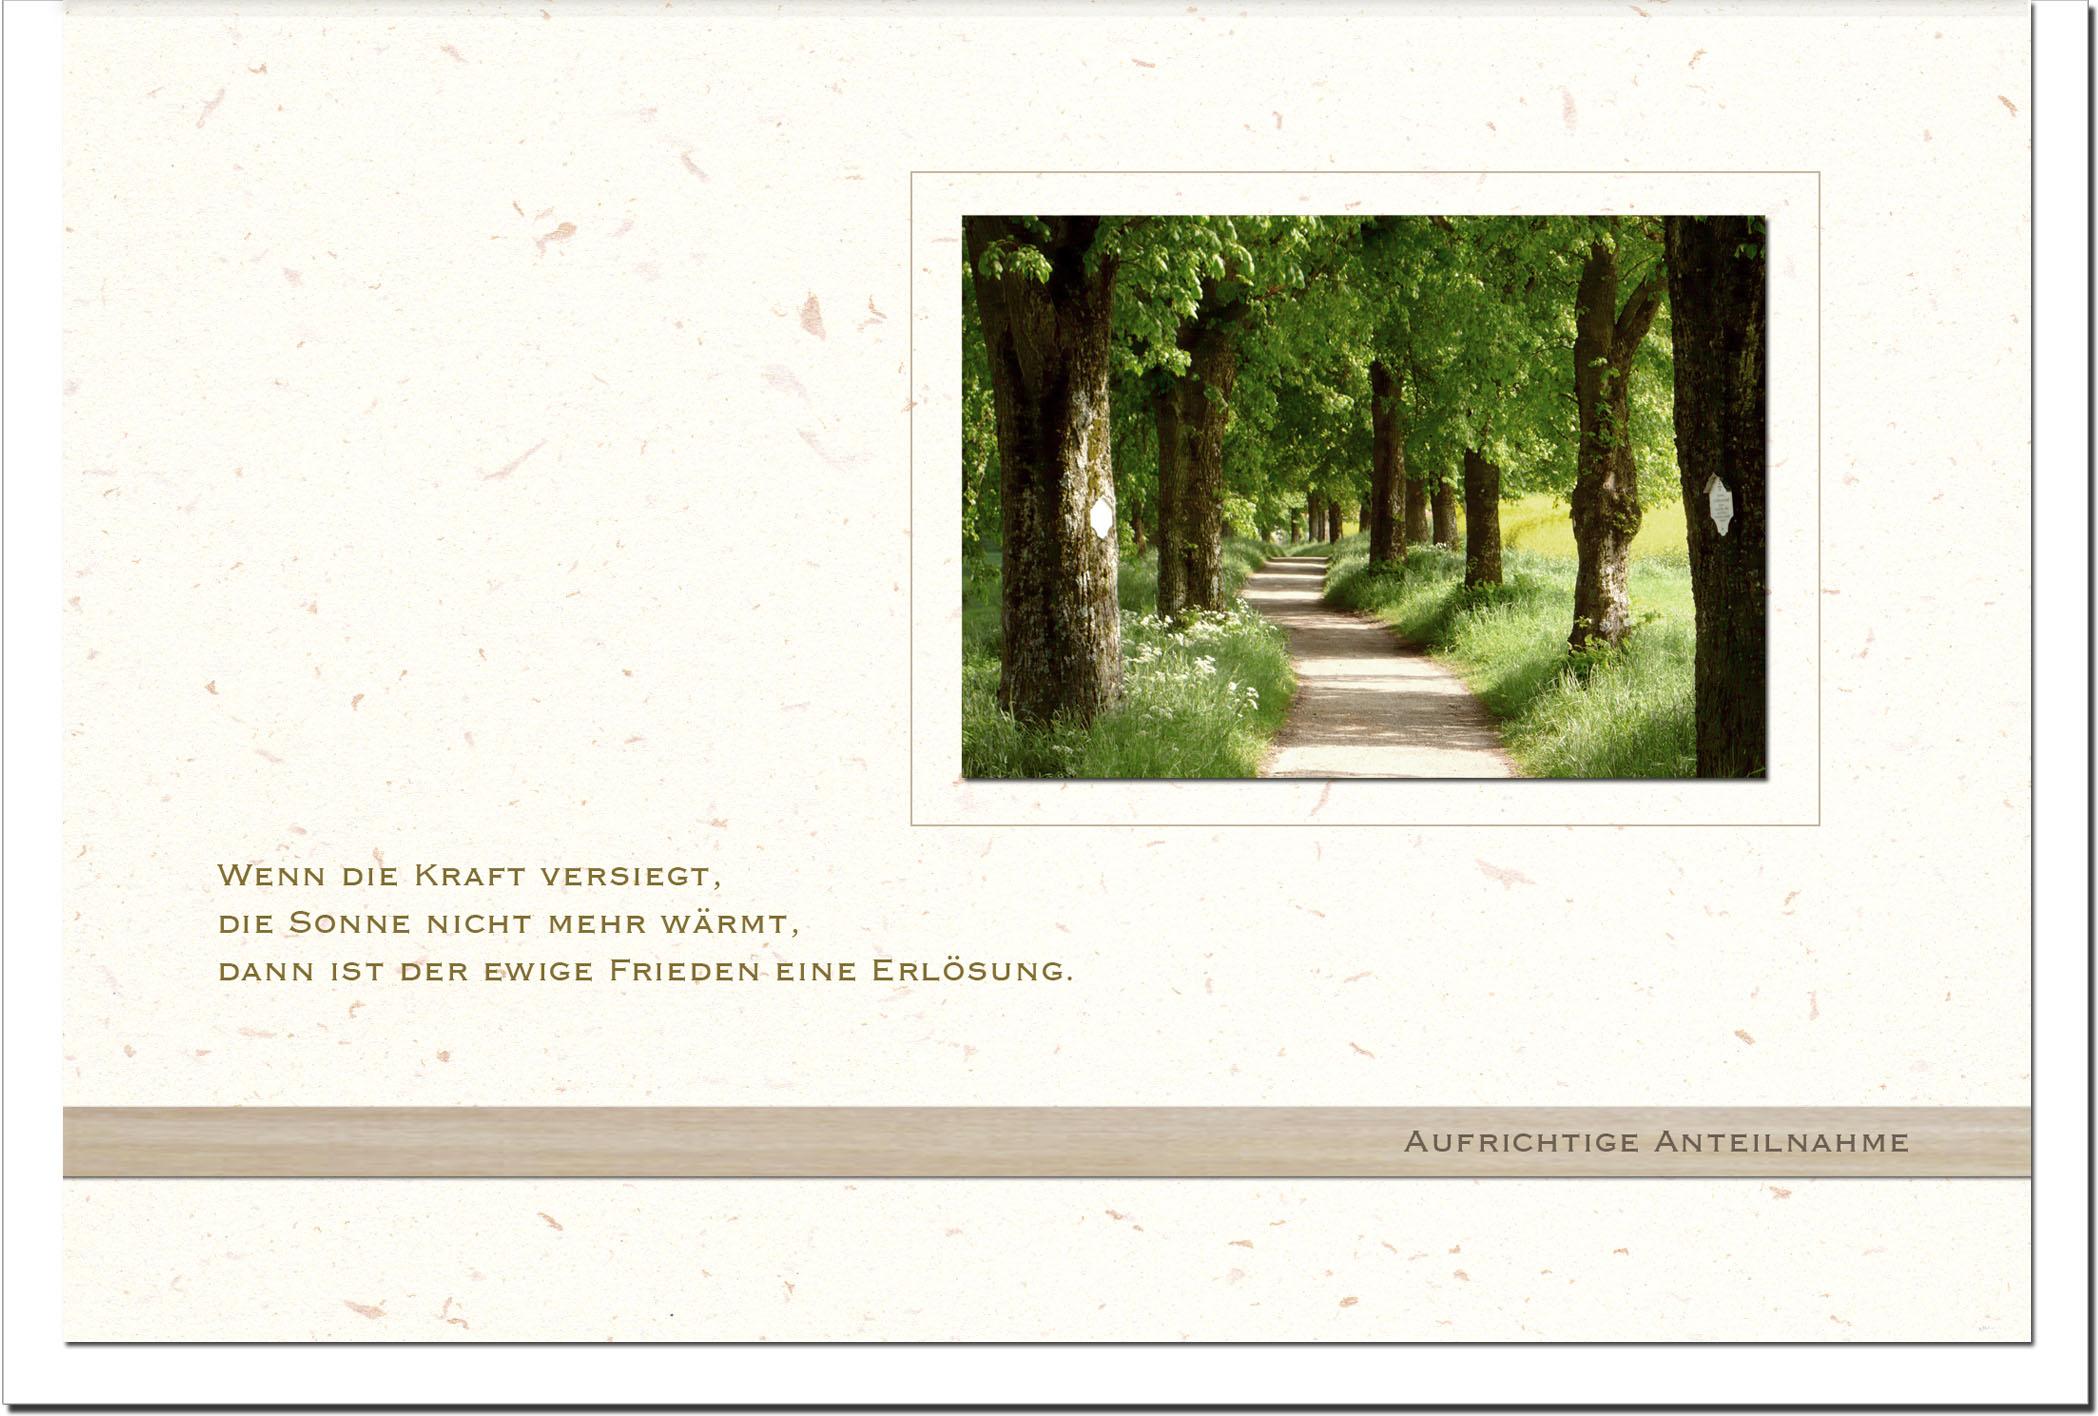 Trauerkarte ERLÖSUNG | Waldweg | metALUm #00566